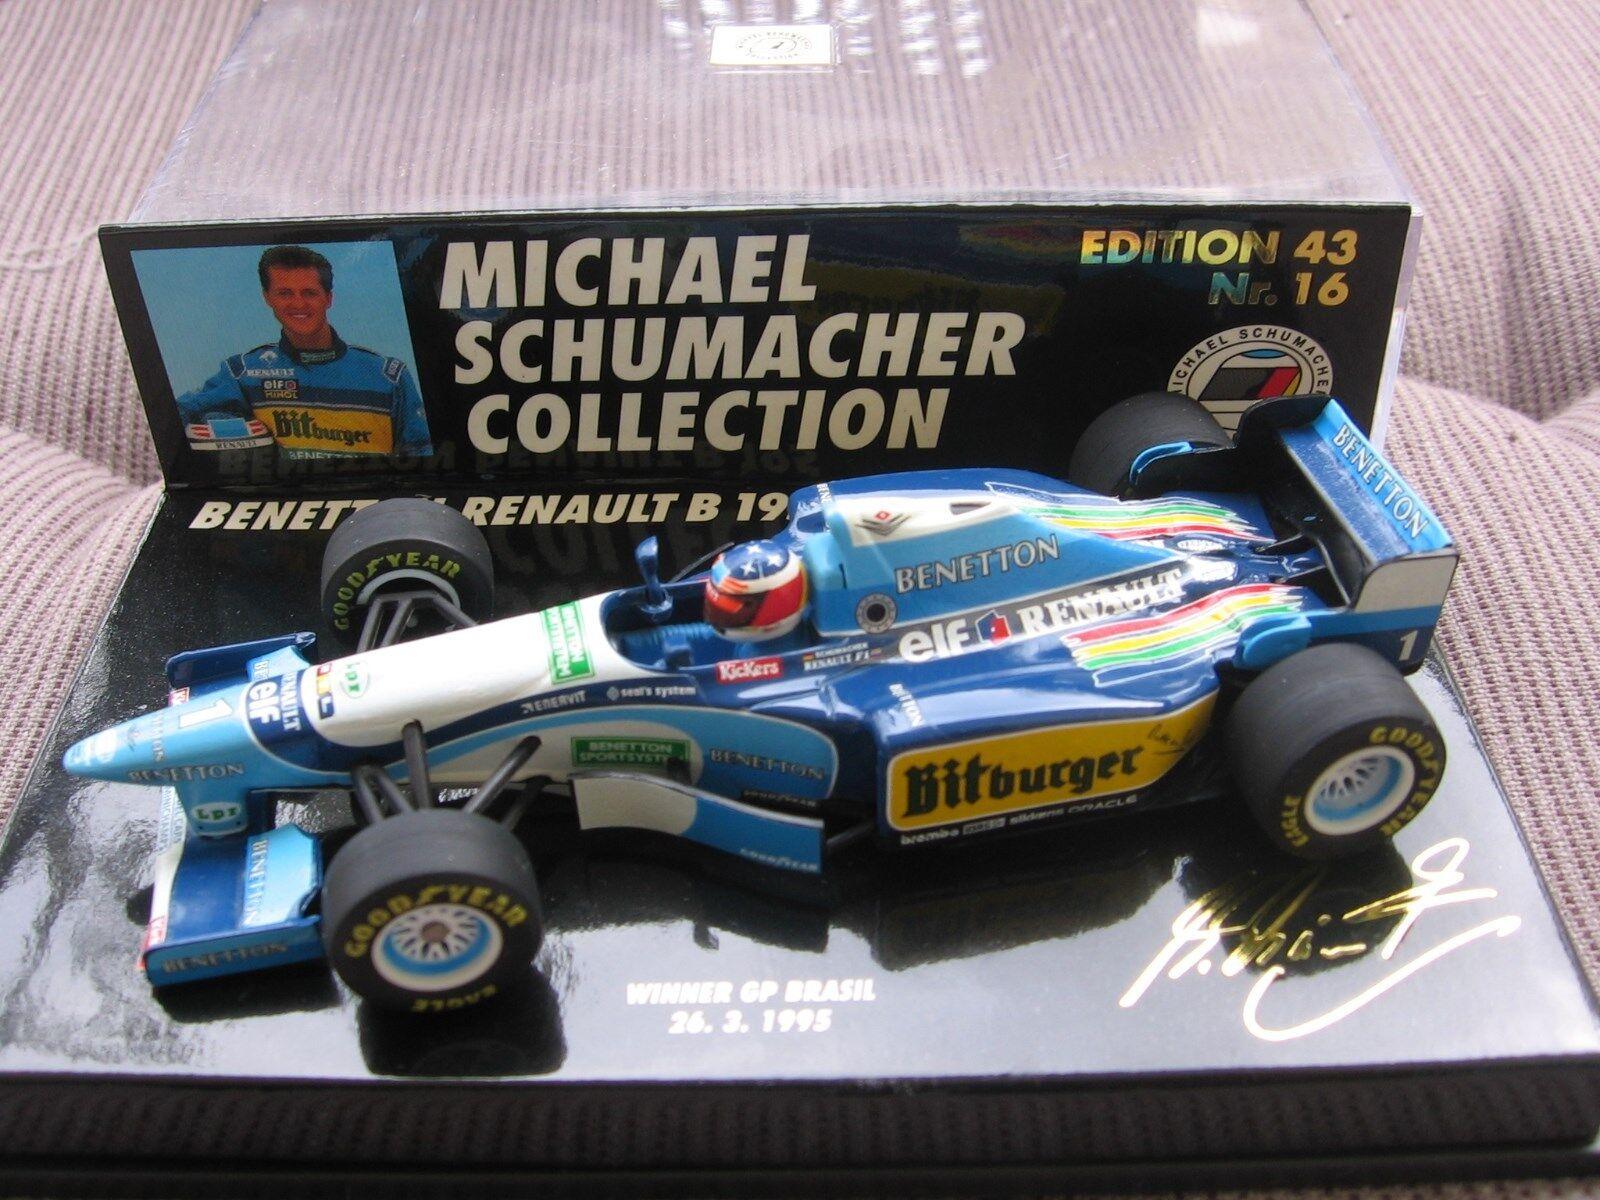 MSC Schumacher f1 Benetton Renault b195 GP BRAZIL 1995 1 43 16 Minichamps OVP